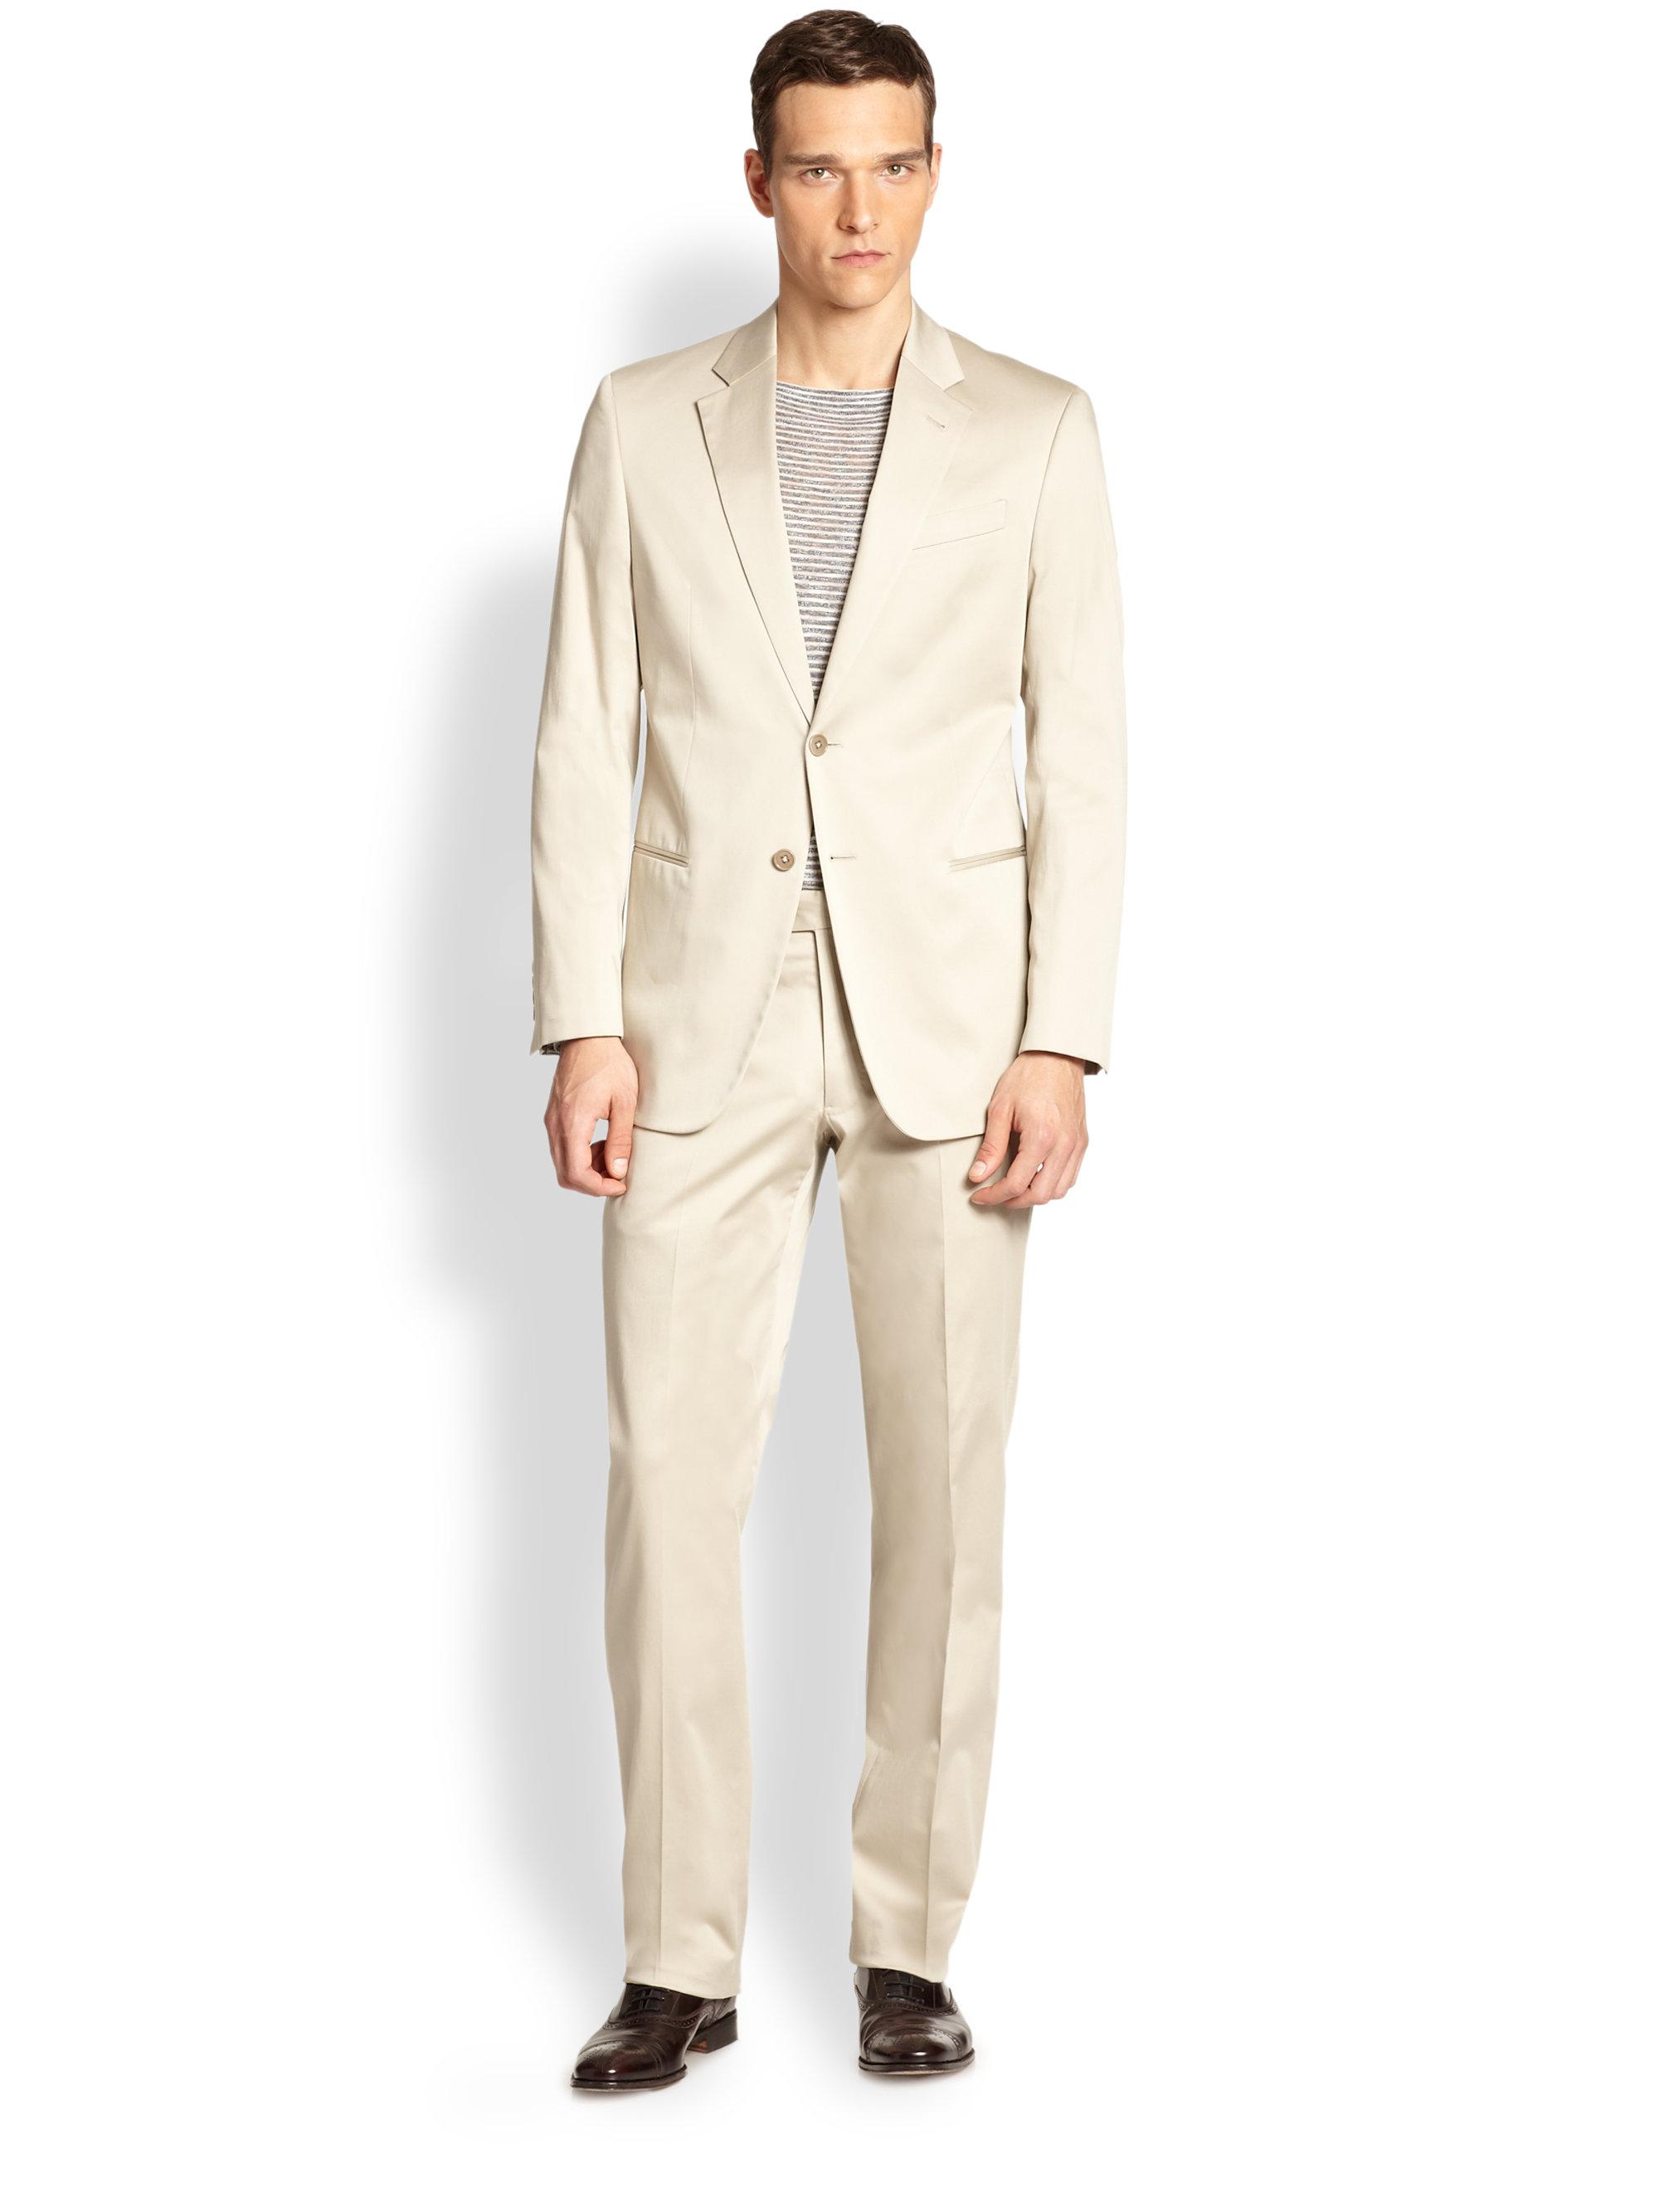 White Armani suits photos